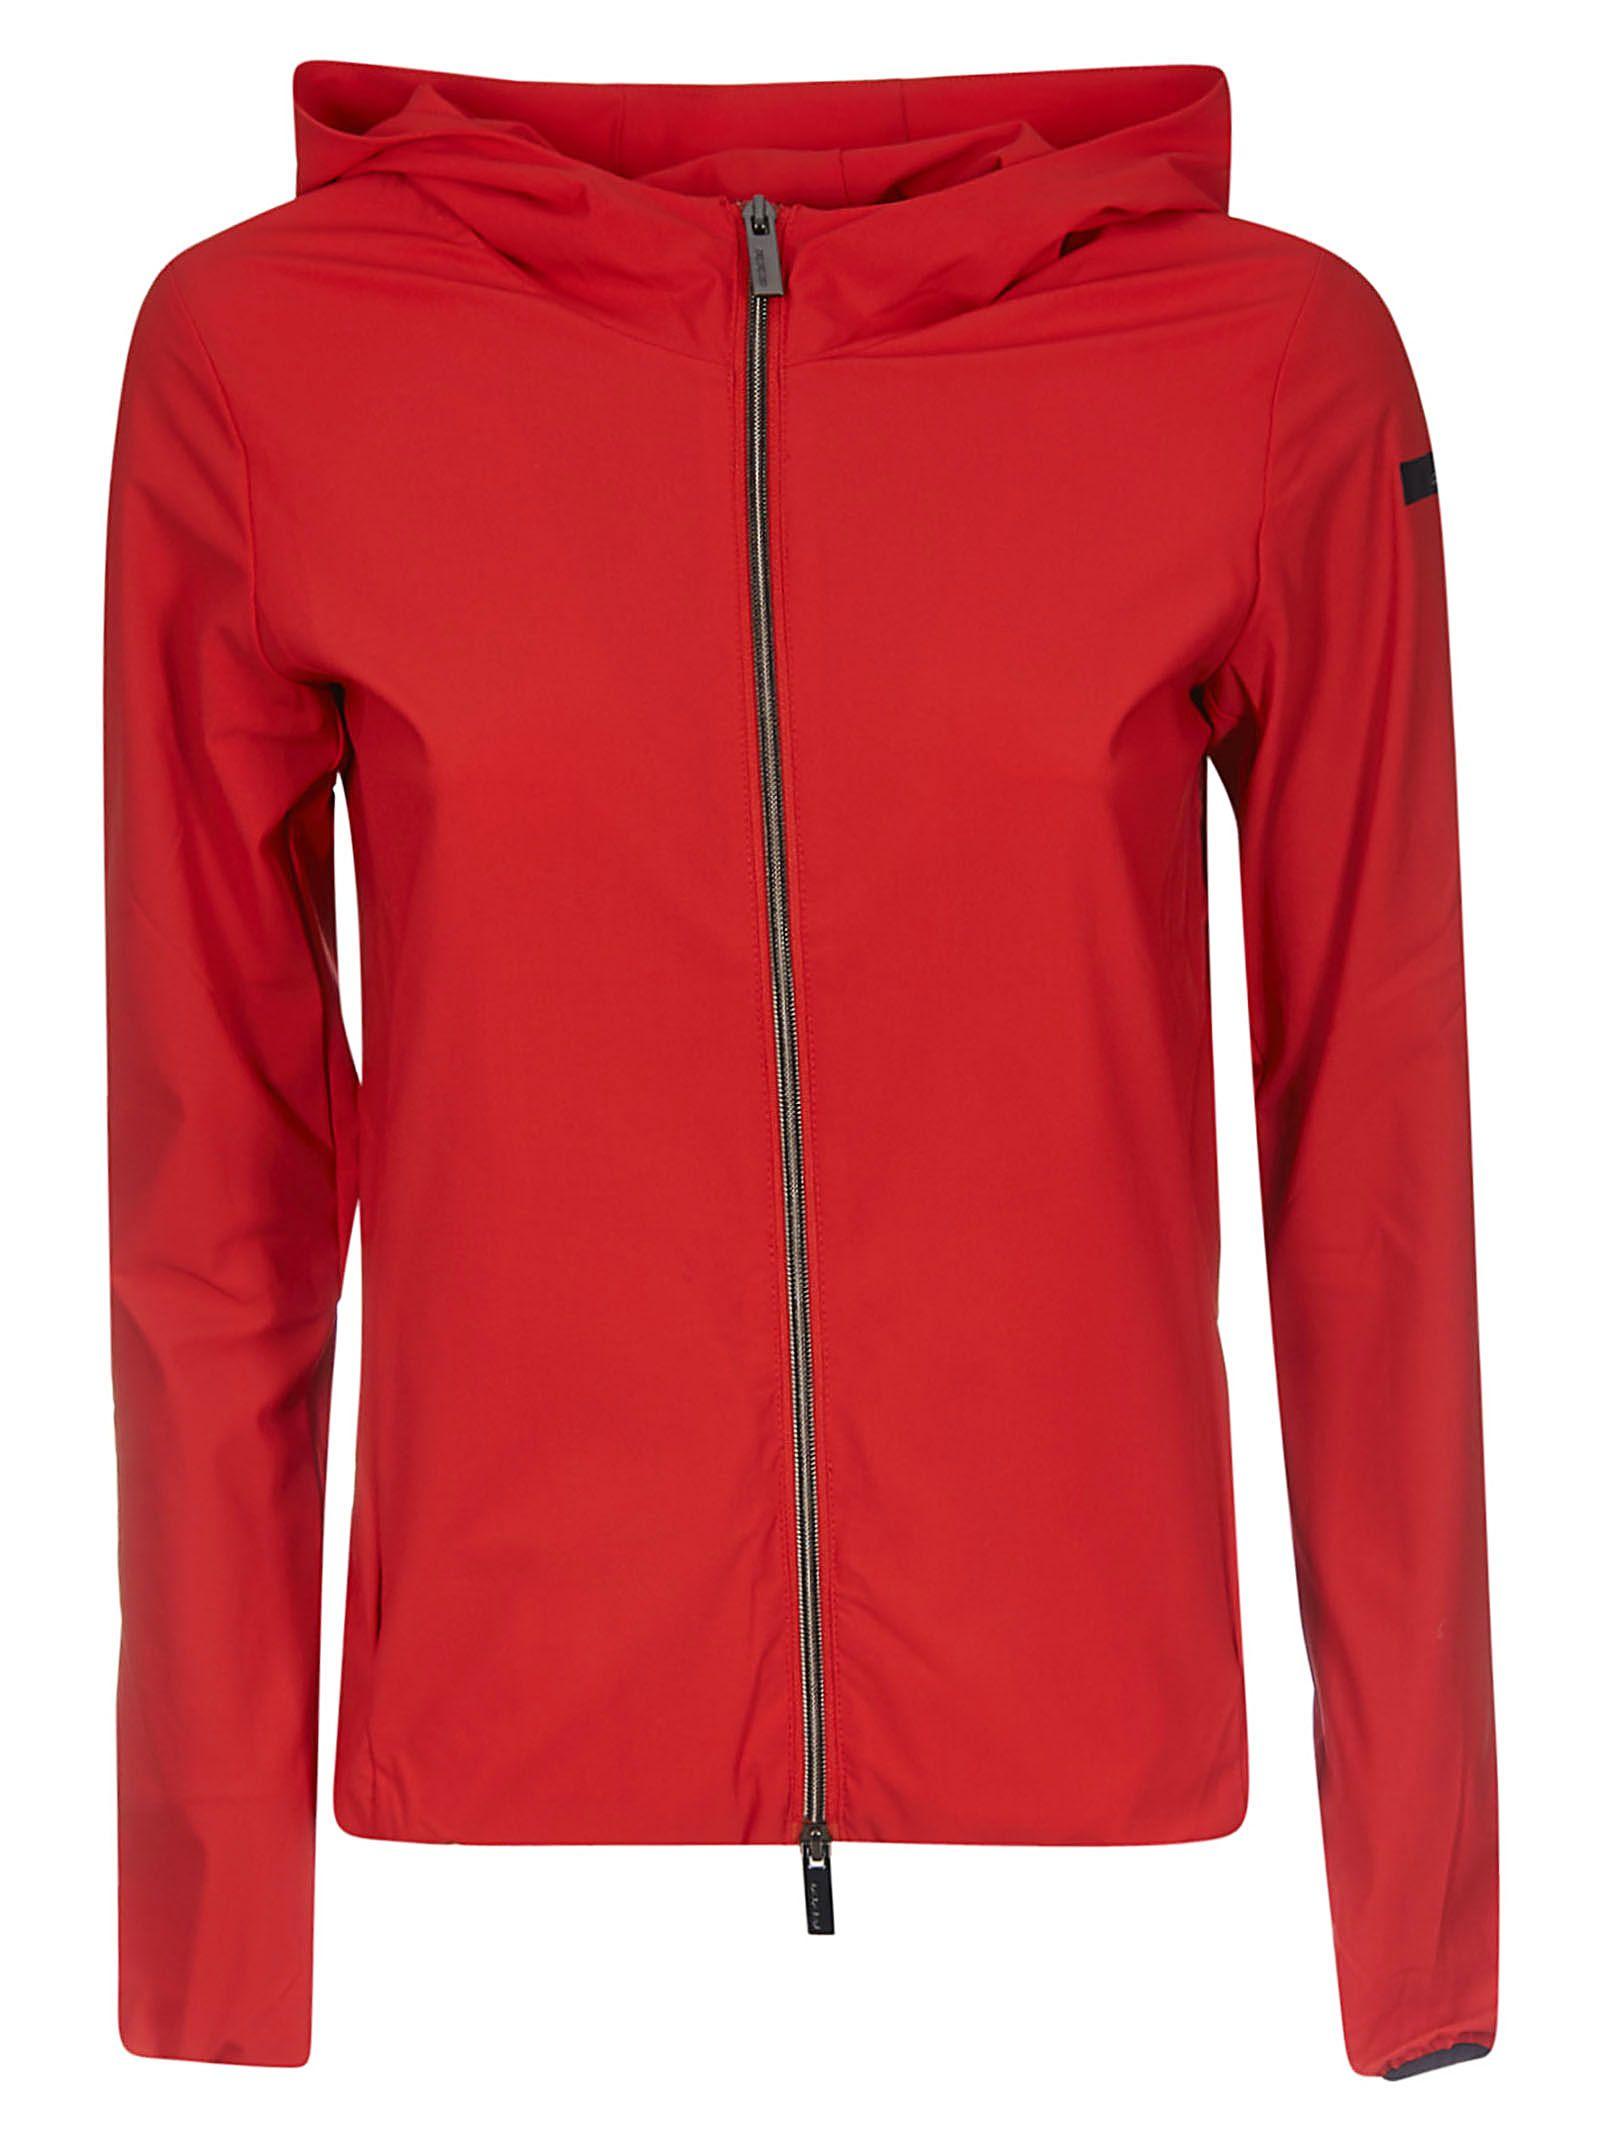 Rrd - Roberto Ricci Design Hooded Jacket